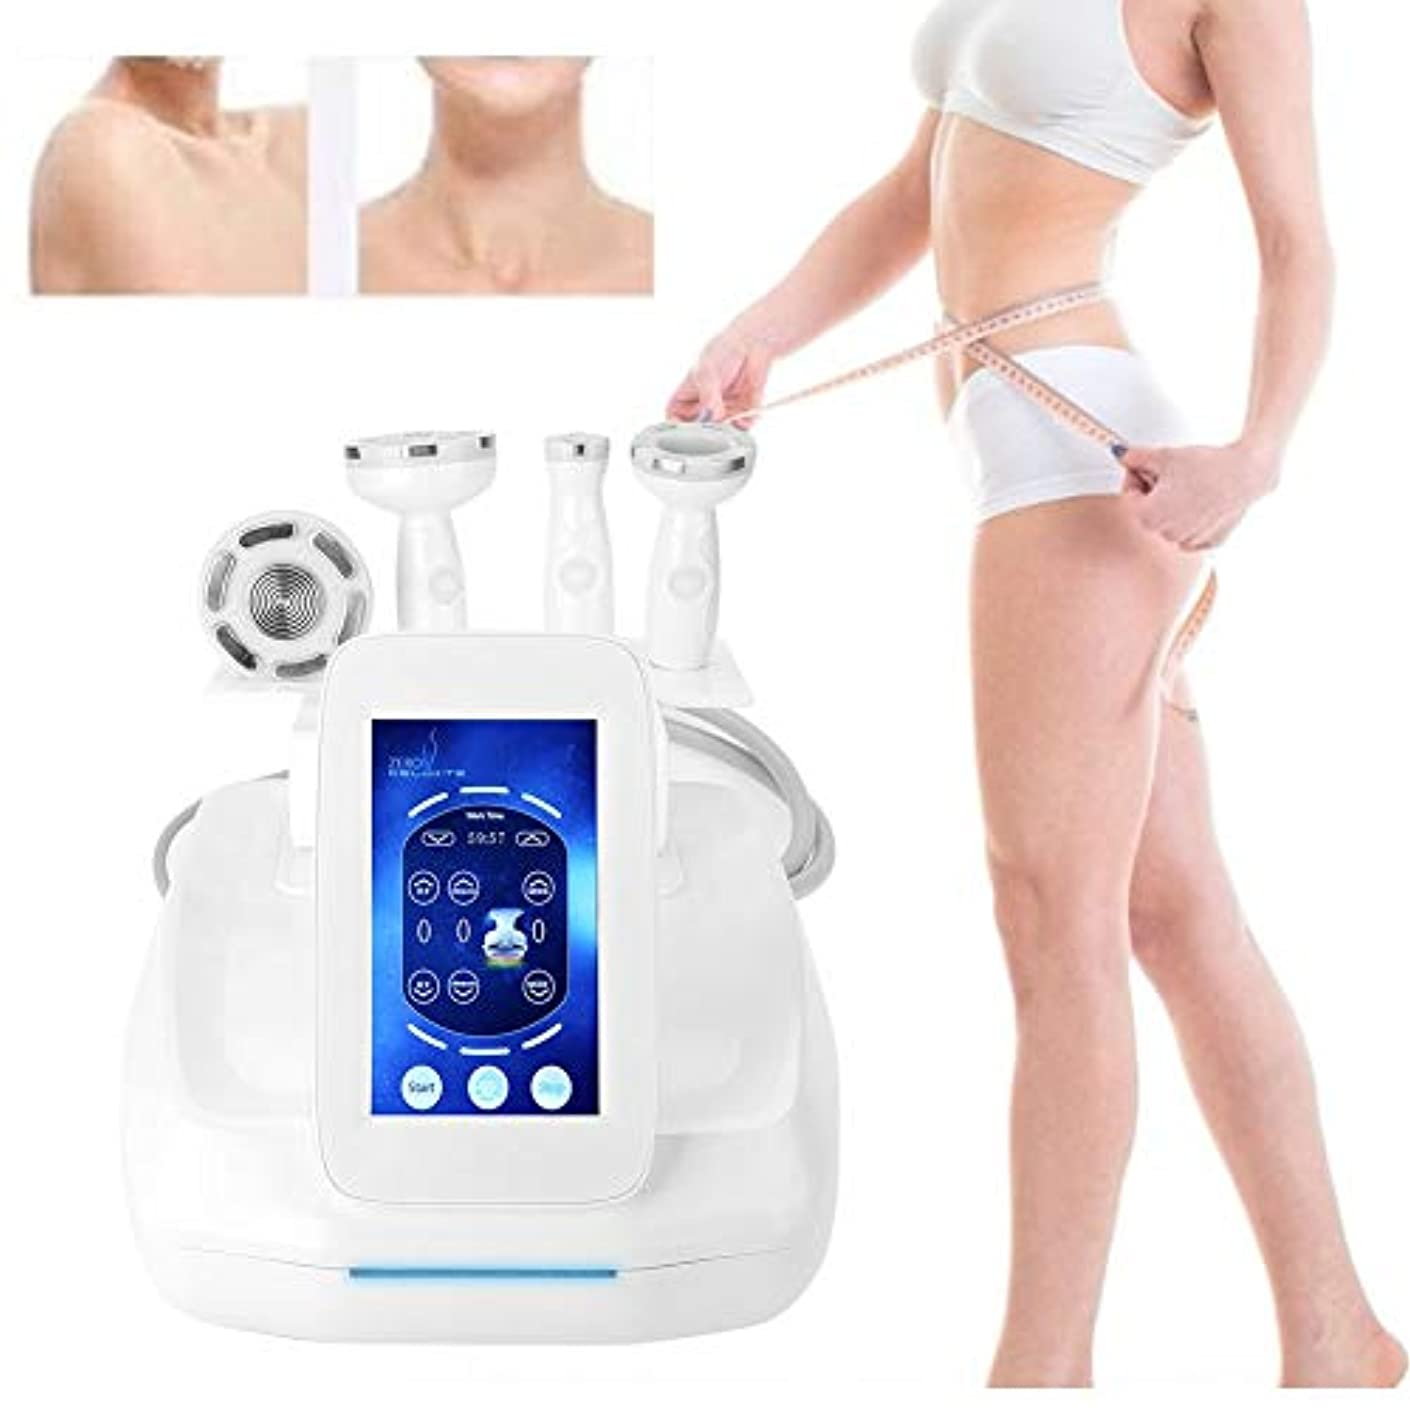 40K振動ボディ整形マッサージャー、全身の減量のマッサージャーの多極発破脂肪の器械の美顔術(3つのマッサージの頭部)セリウム、FDAの承認の持ち上がること(110V - 220V)